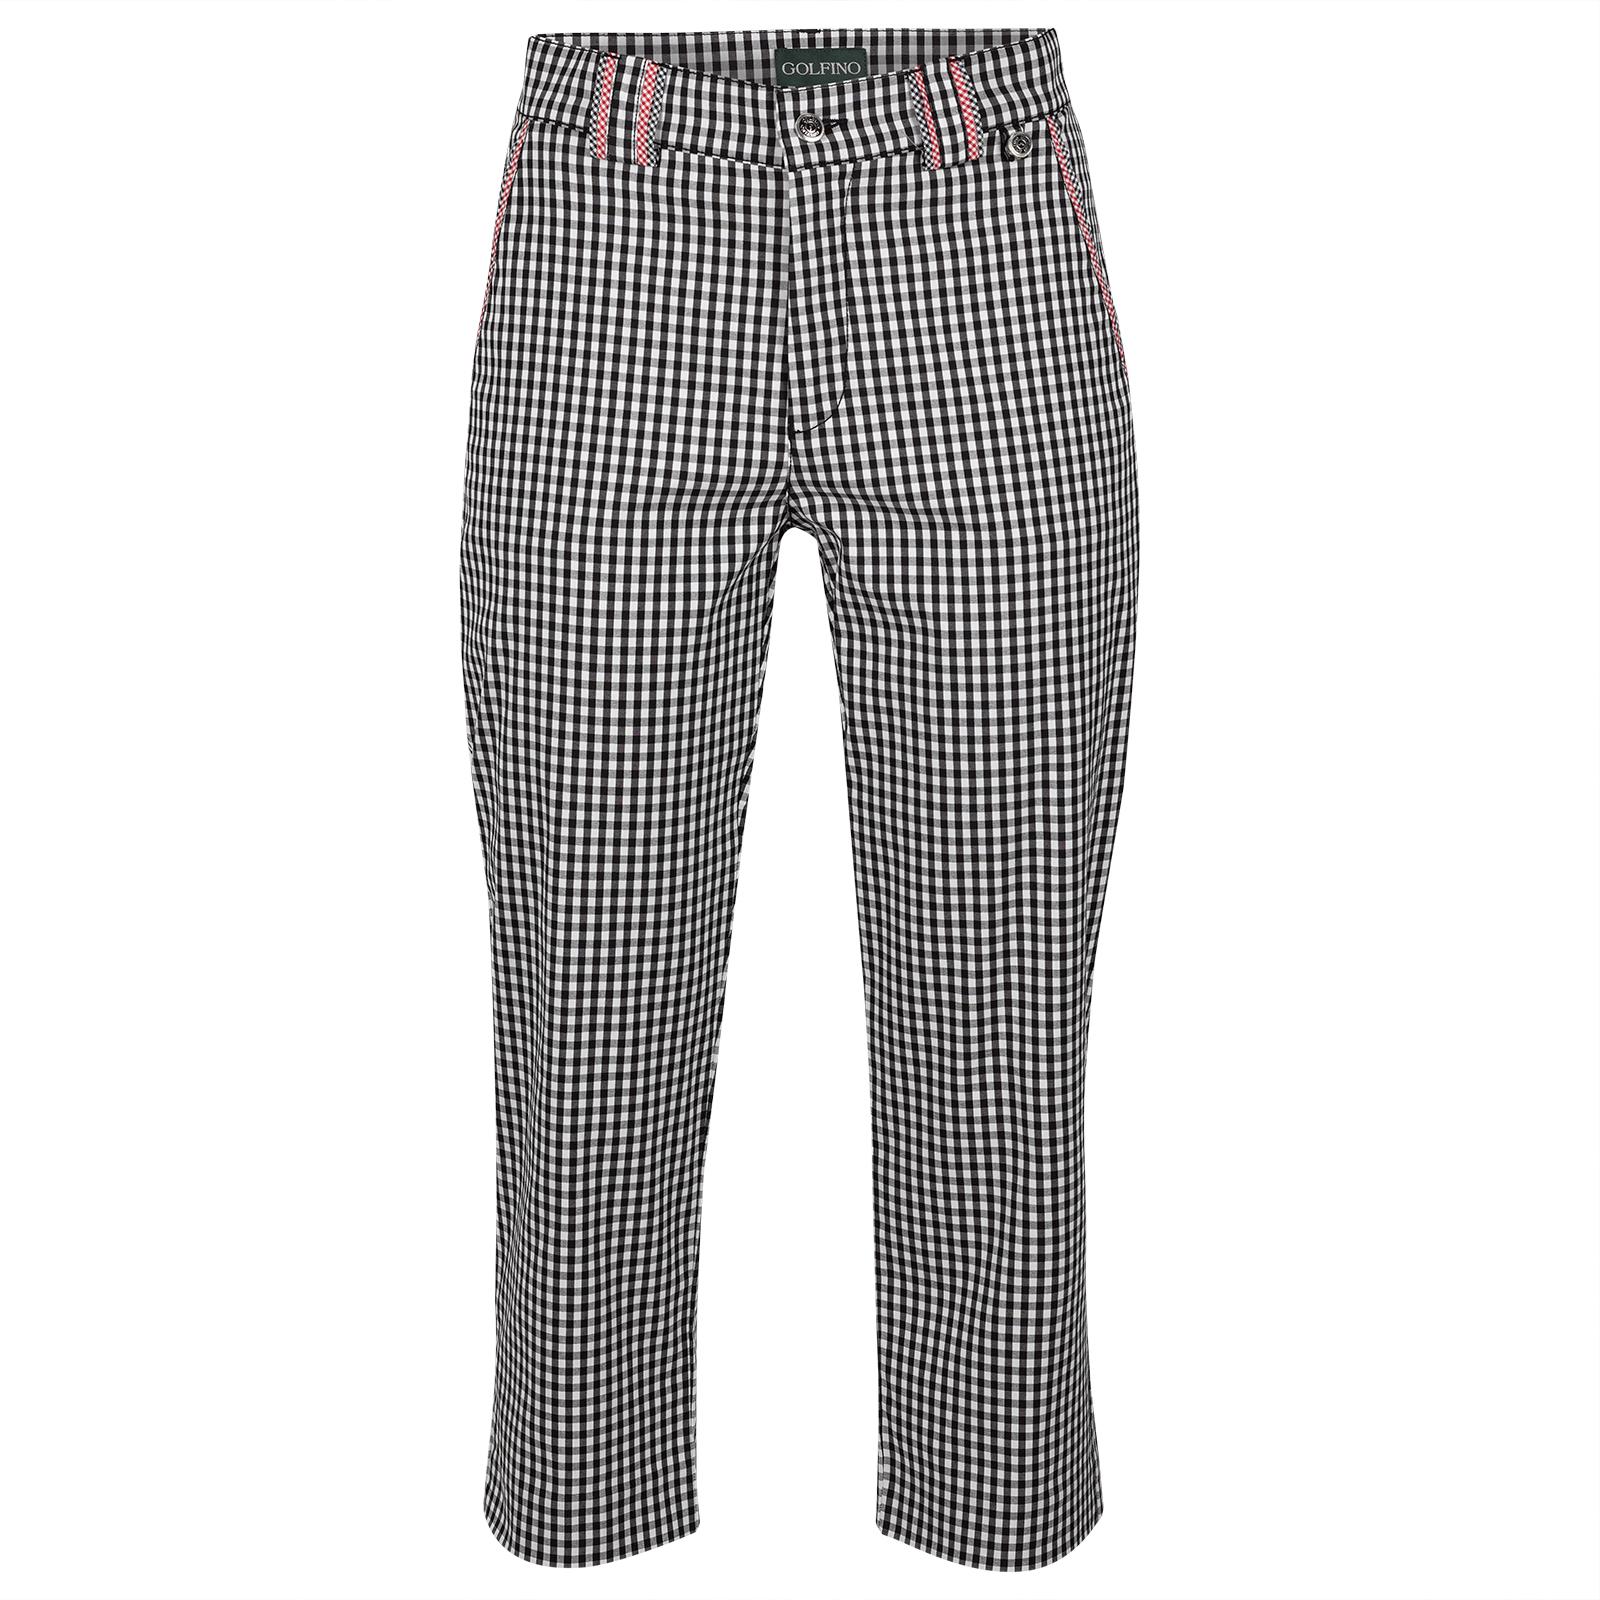 Pantalón capri de Golf con modernos cuadros Vichy y función elástica